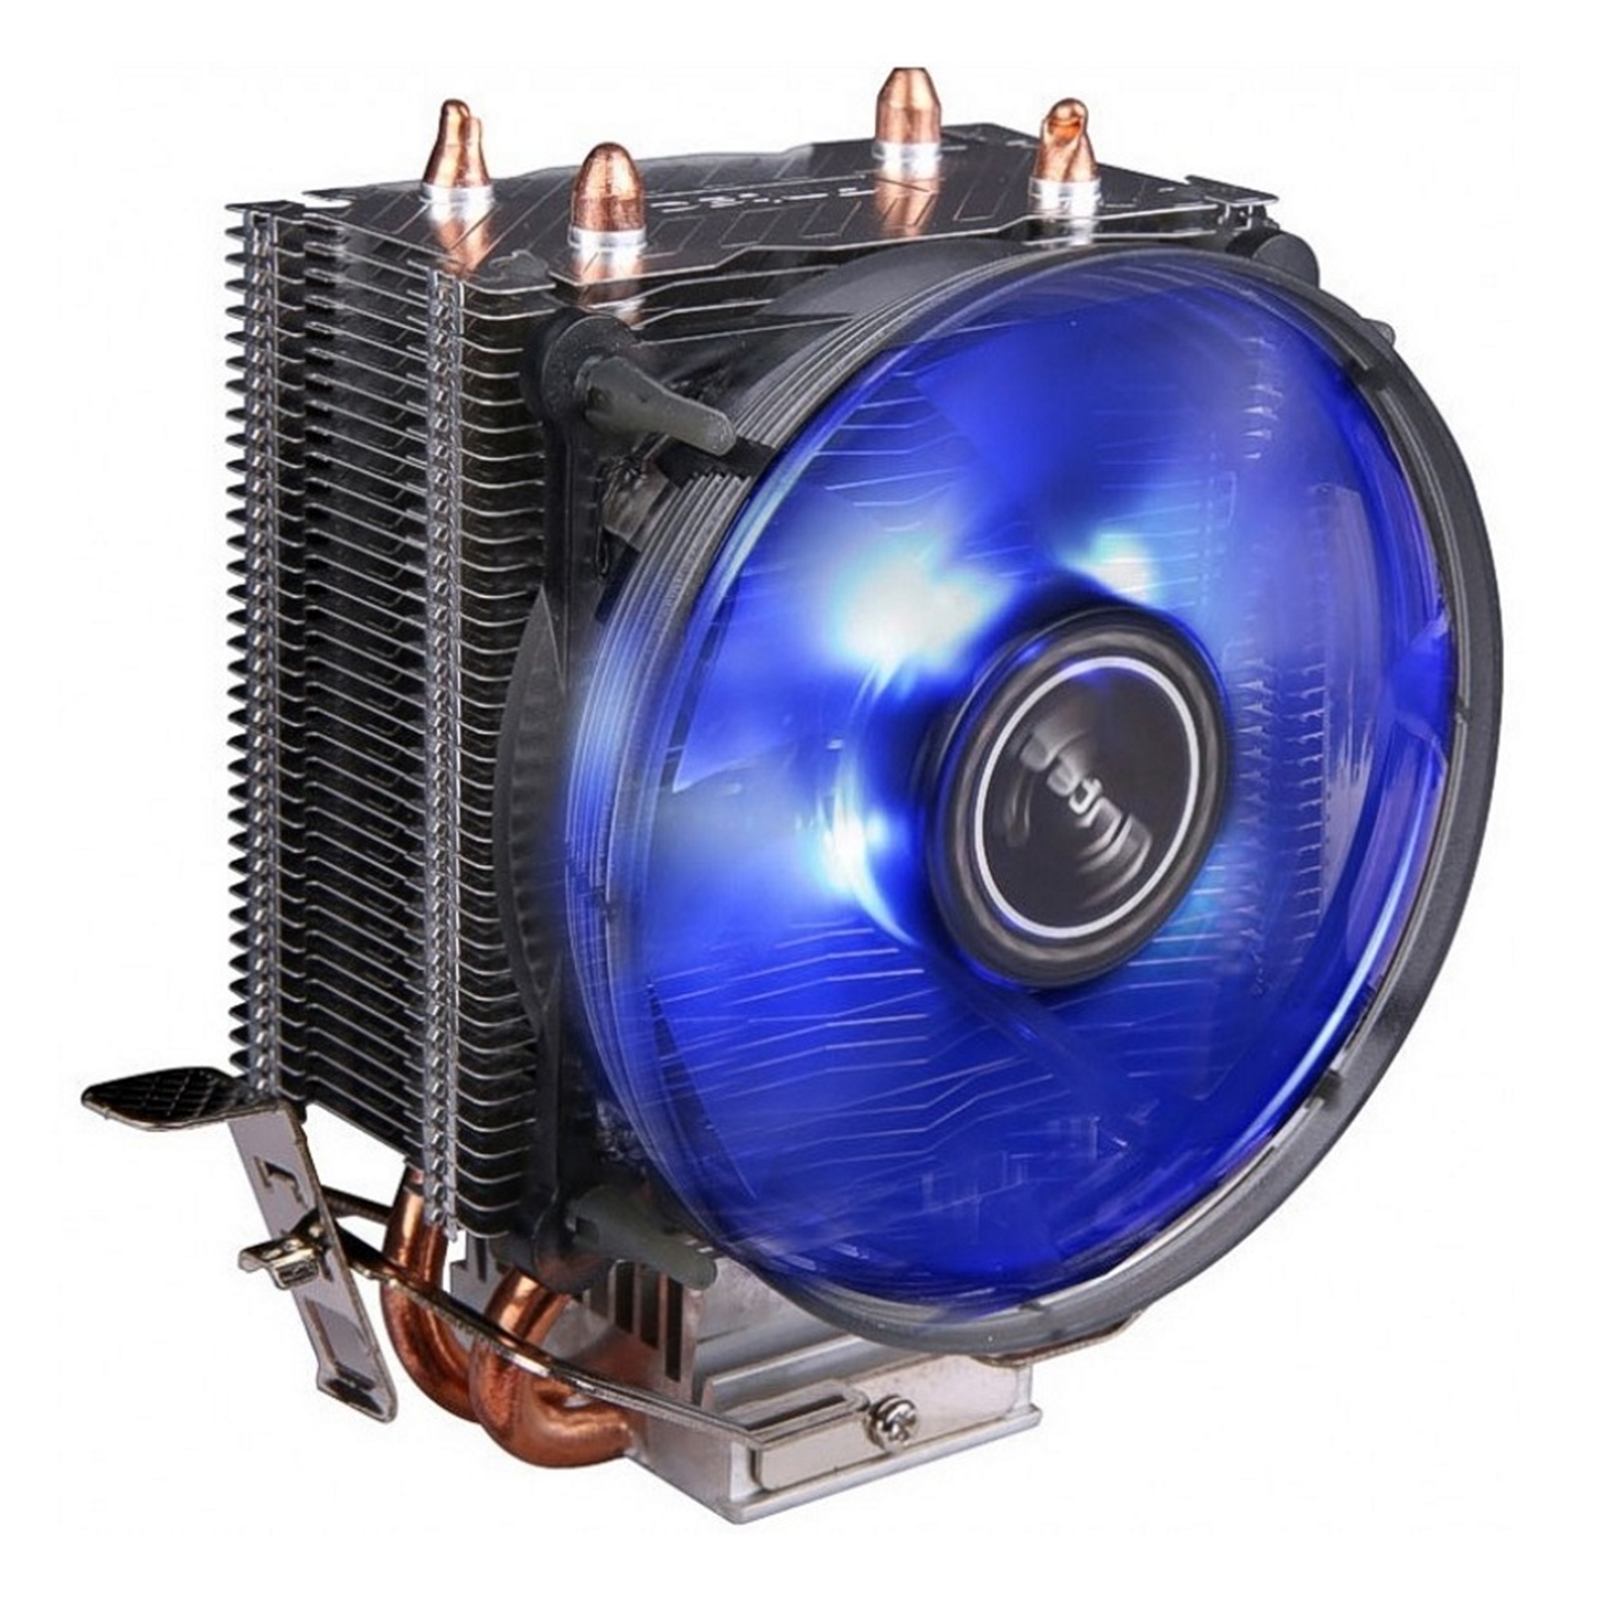 Antec A30 Universal Socket 92mm PWM 1750RPM Blue LED Fan CPU Cooler